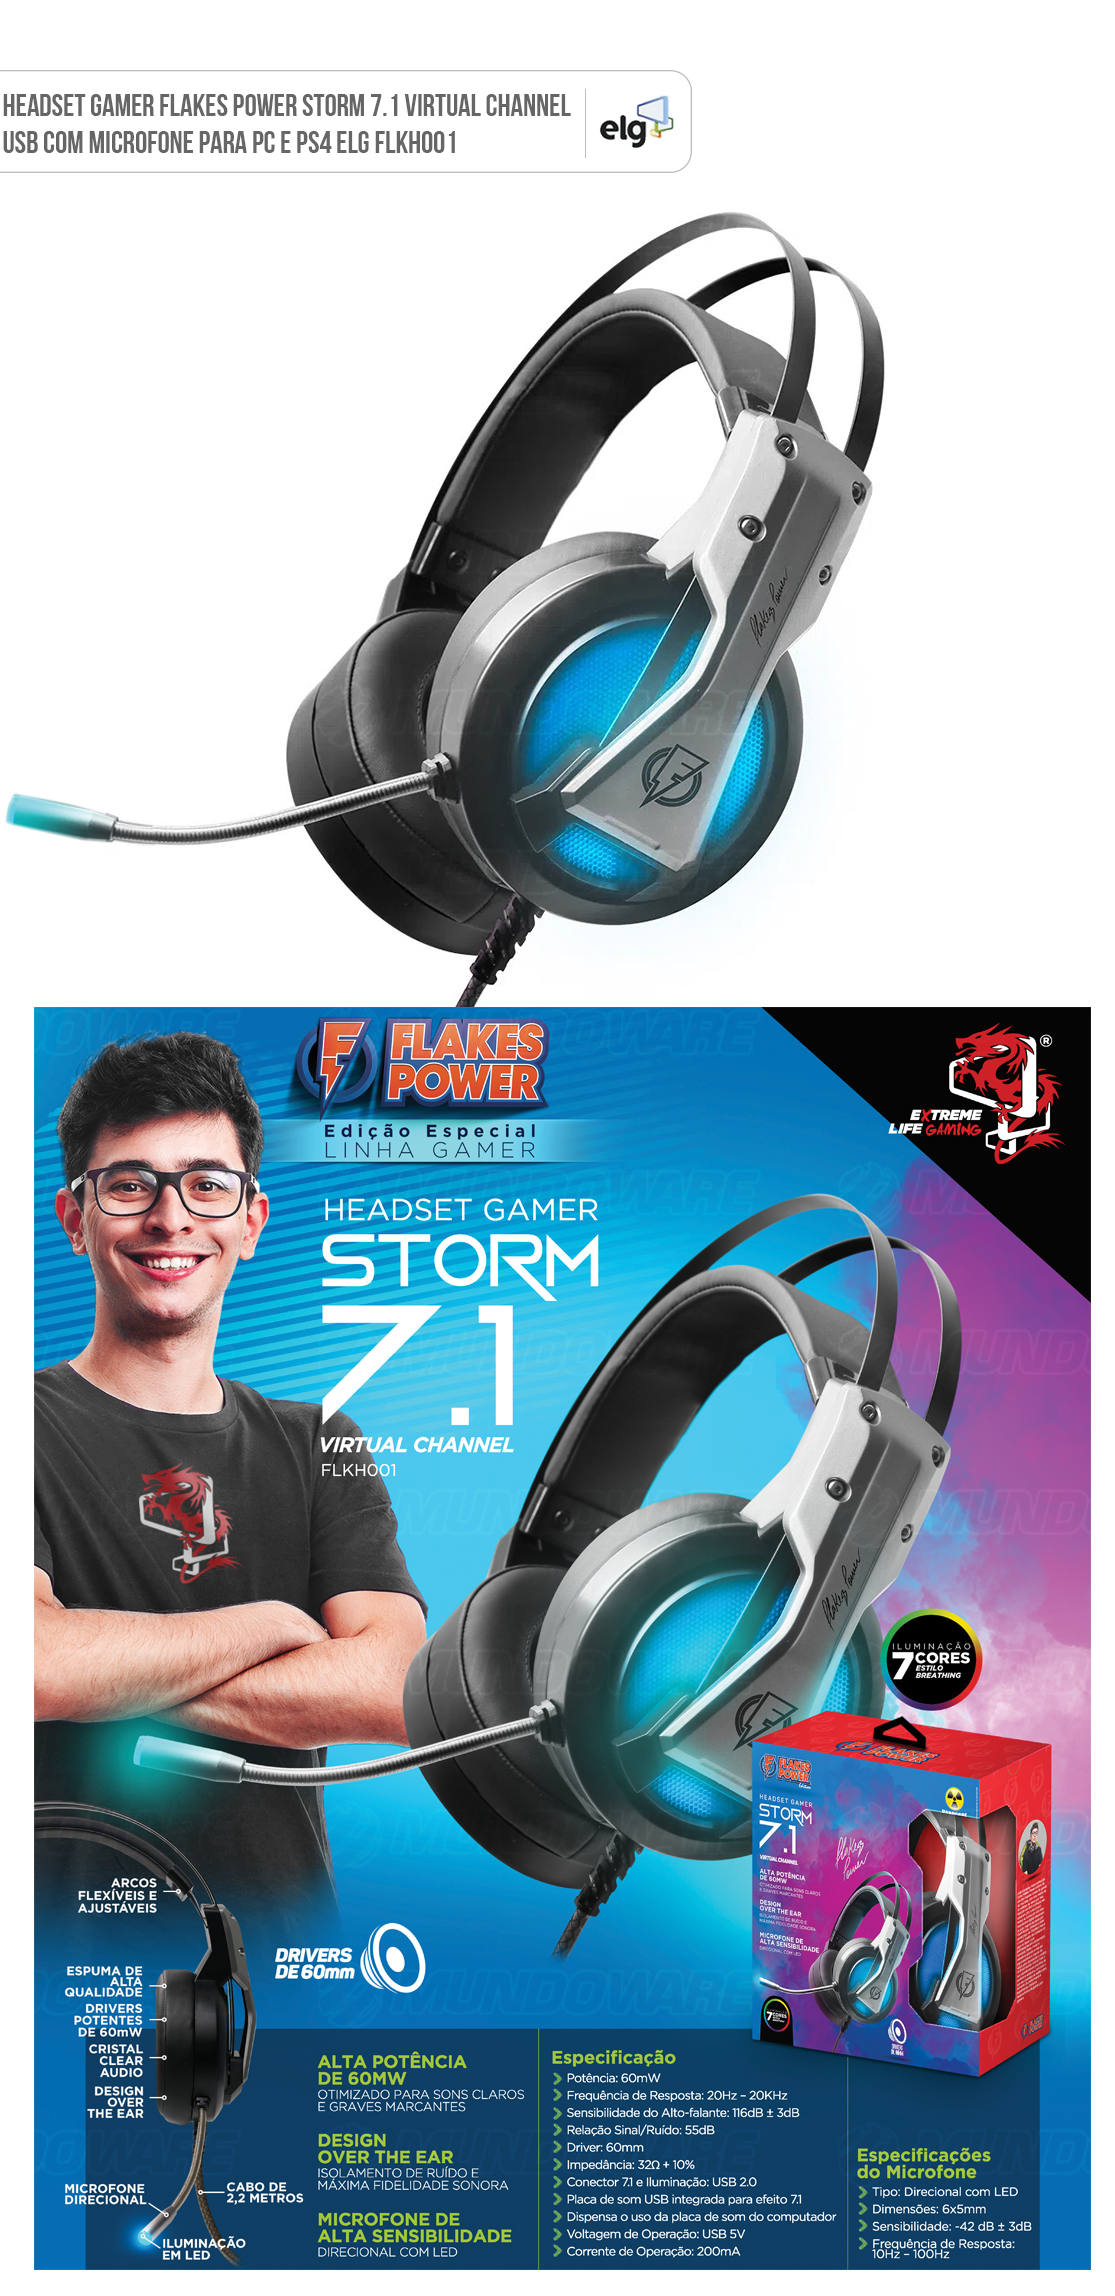 Headset Gamer Flakes Power STORM 7.1 Virtual Channel Com Microfone ELG FLKH001